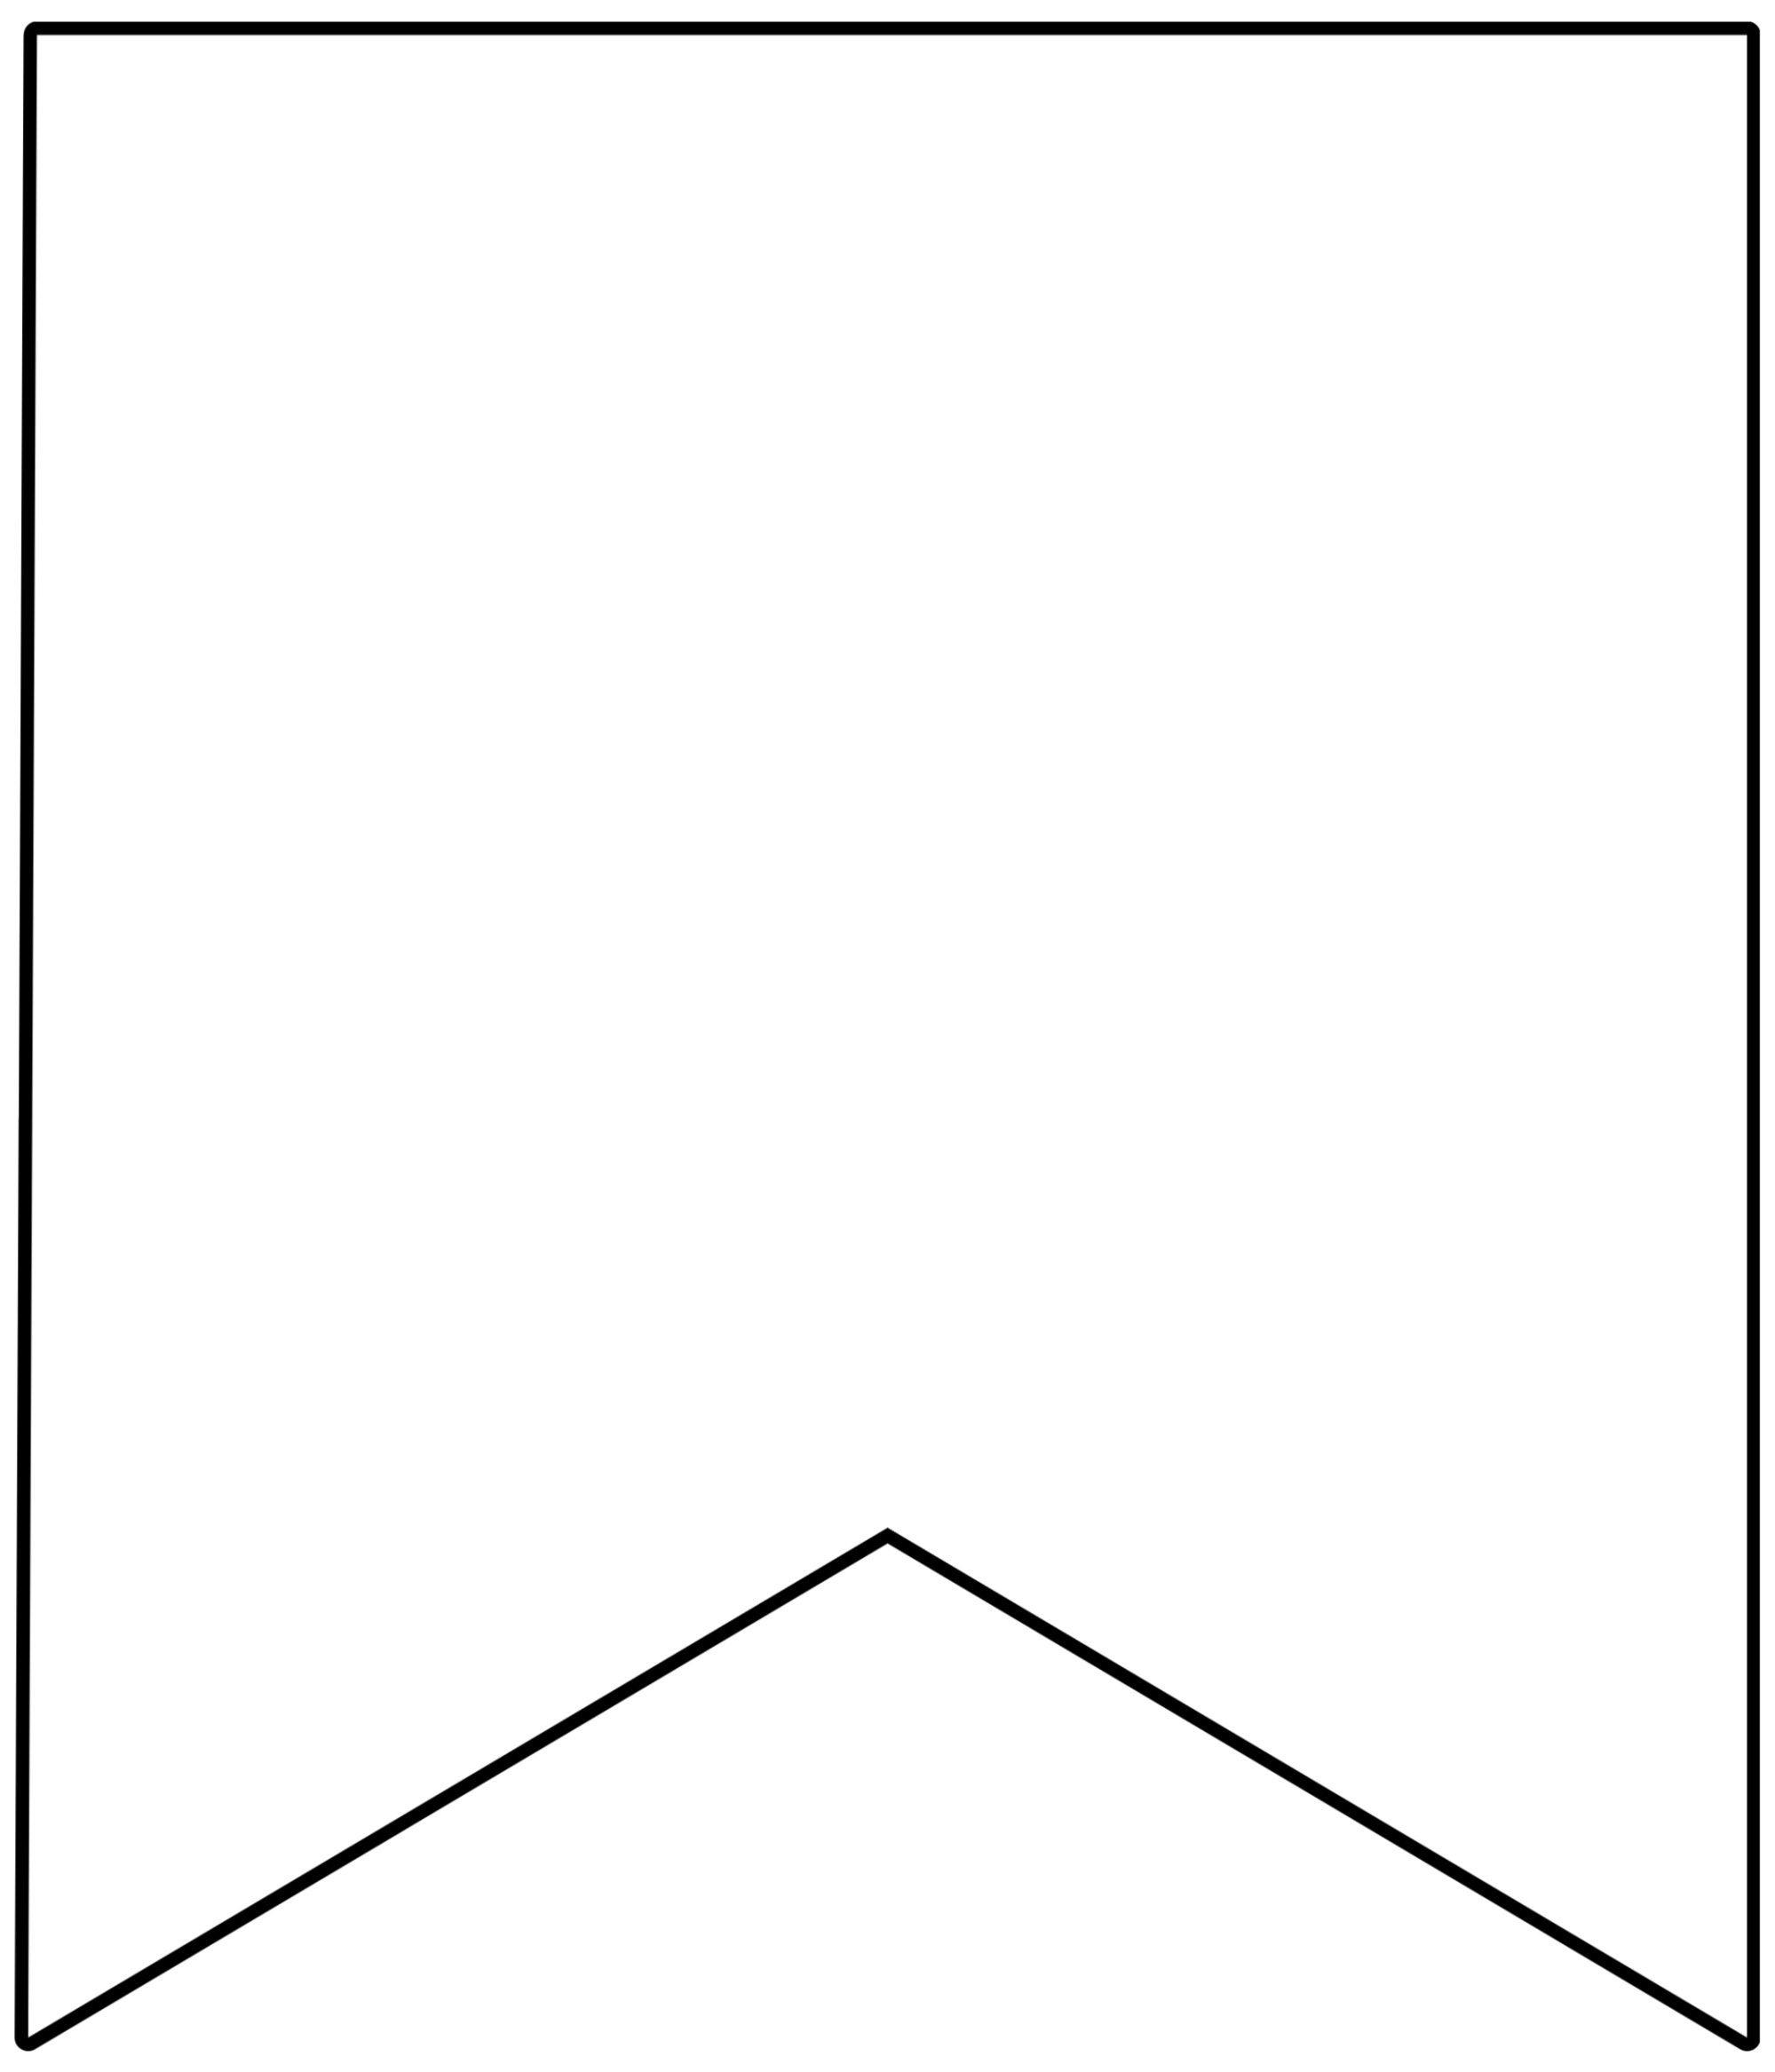 Free Printable Banner Templates - Demir.iso-Consulting.co - Free Printable Banner Templates For Word